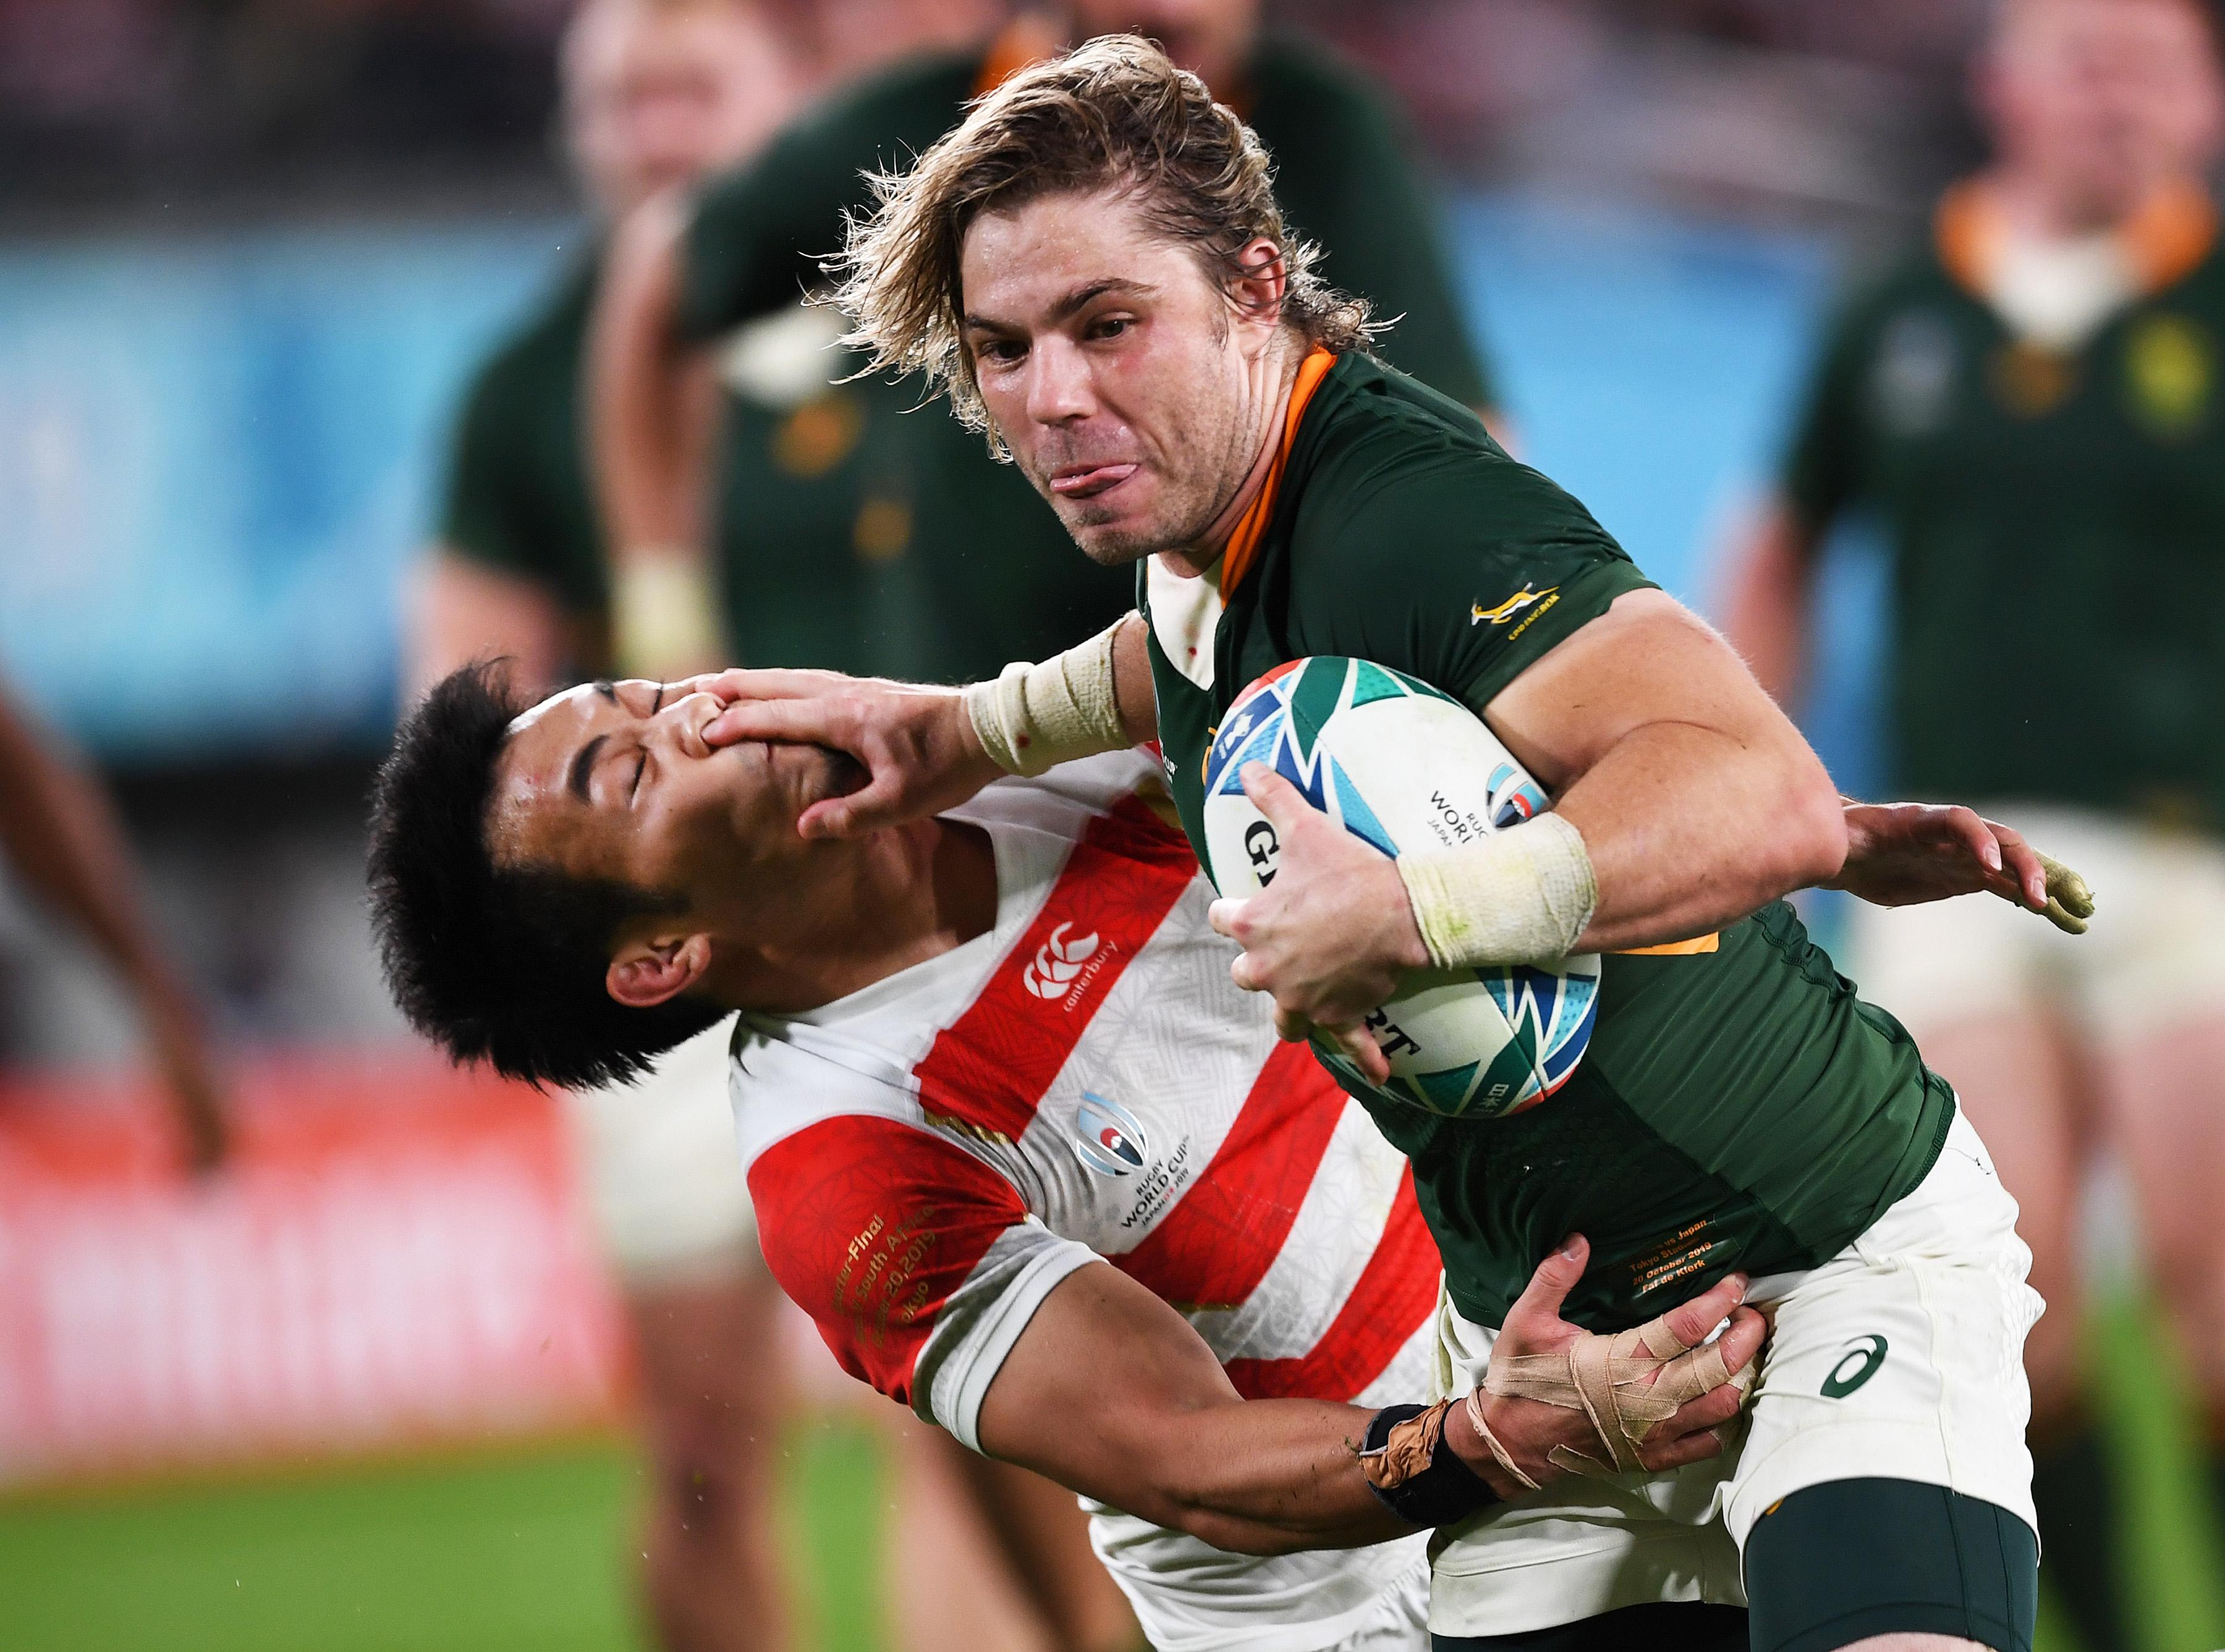 Rugby - Coupe du monde 2019 - Coupe du monde : Faf de Klerk, le «Jack Russell» des Springboks